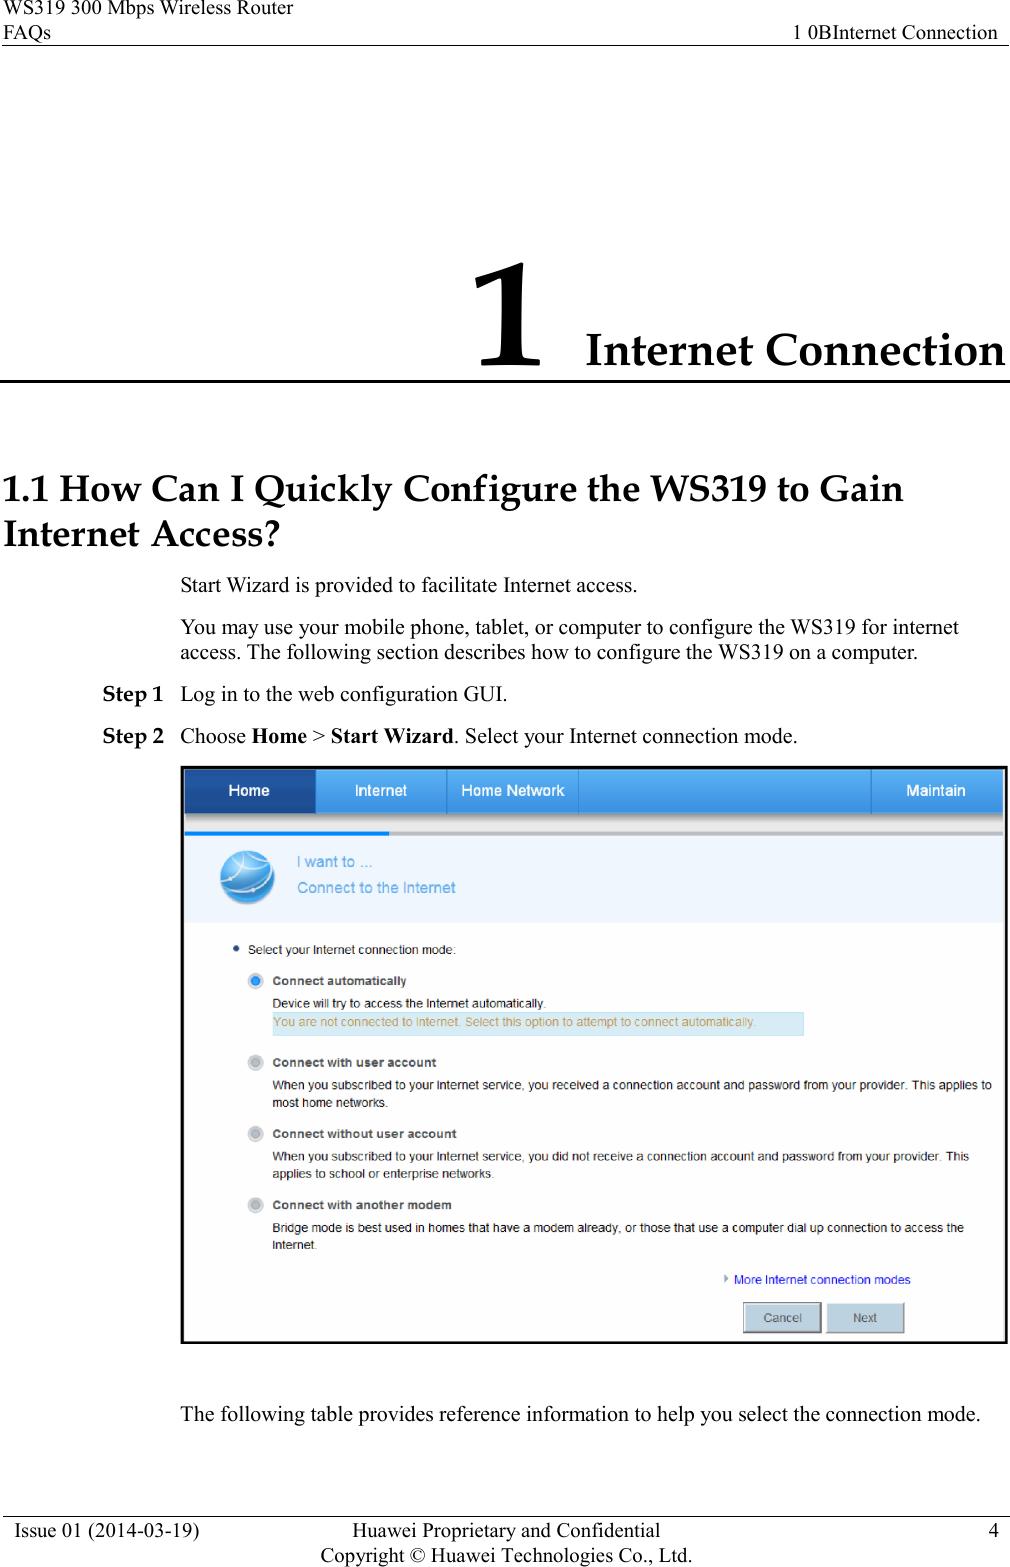 Huawei WS319 FAQs(WS319 10, 01, EN)